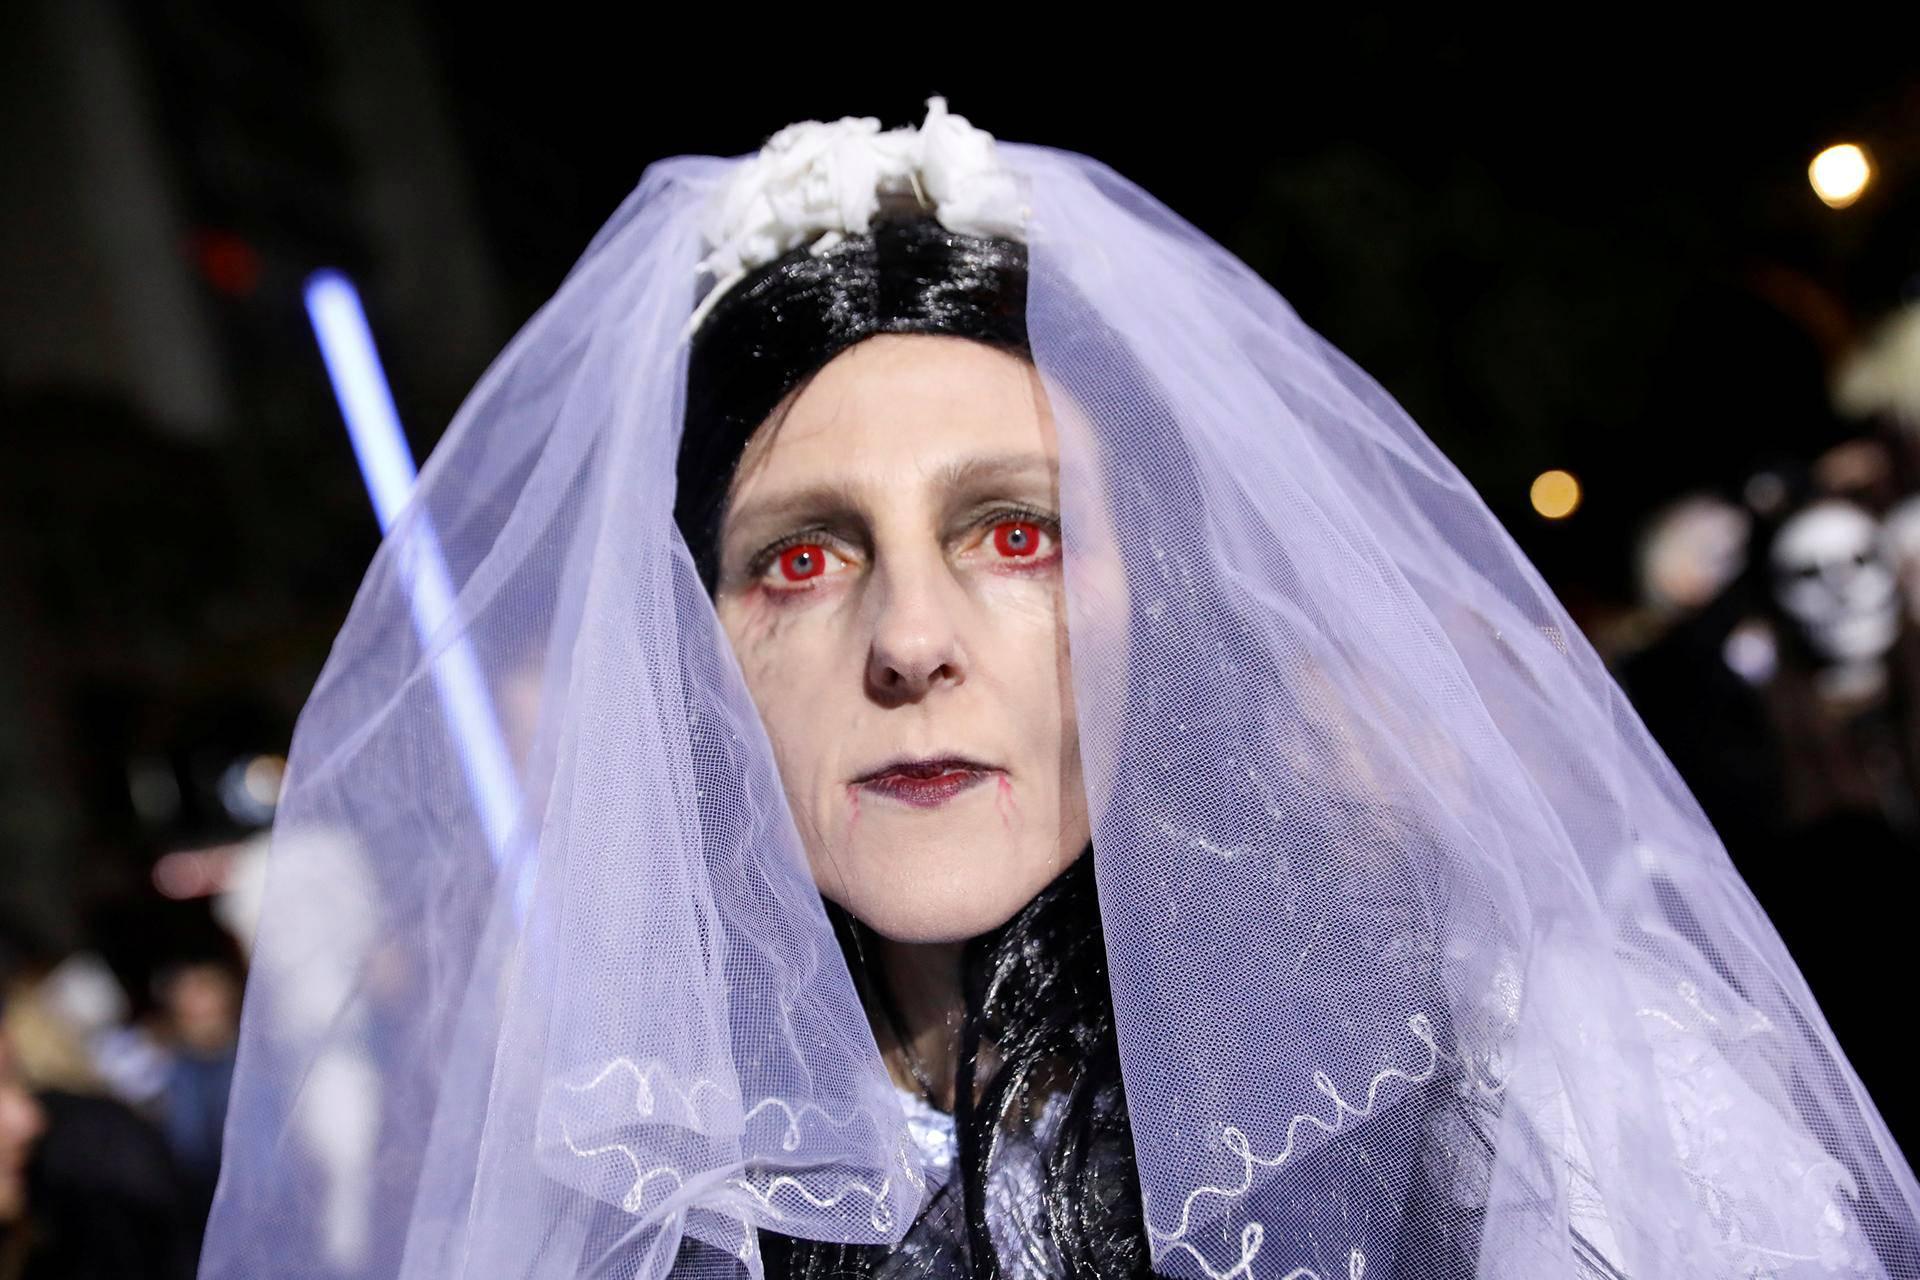 Halloween-morsian New Yorkissa.